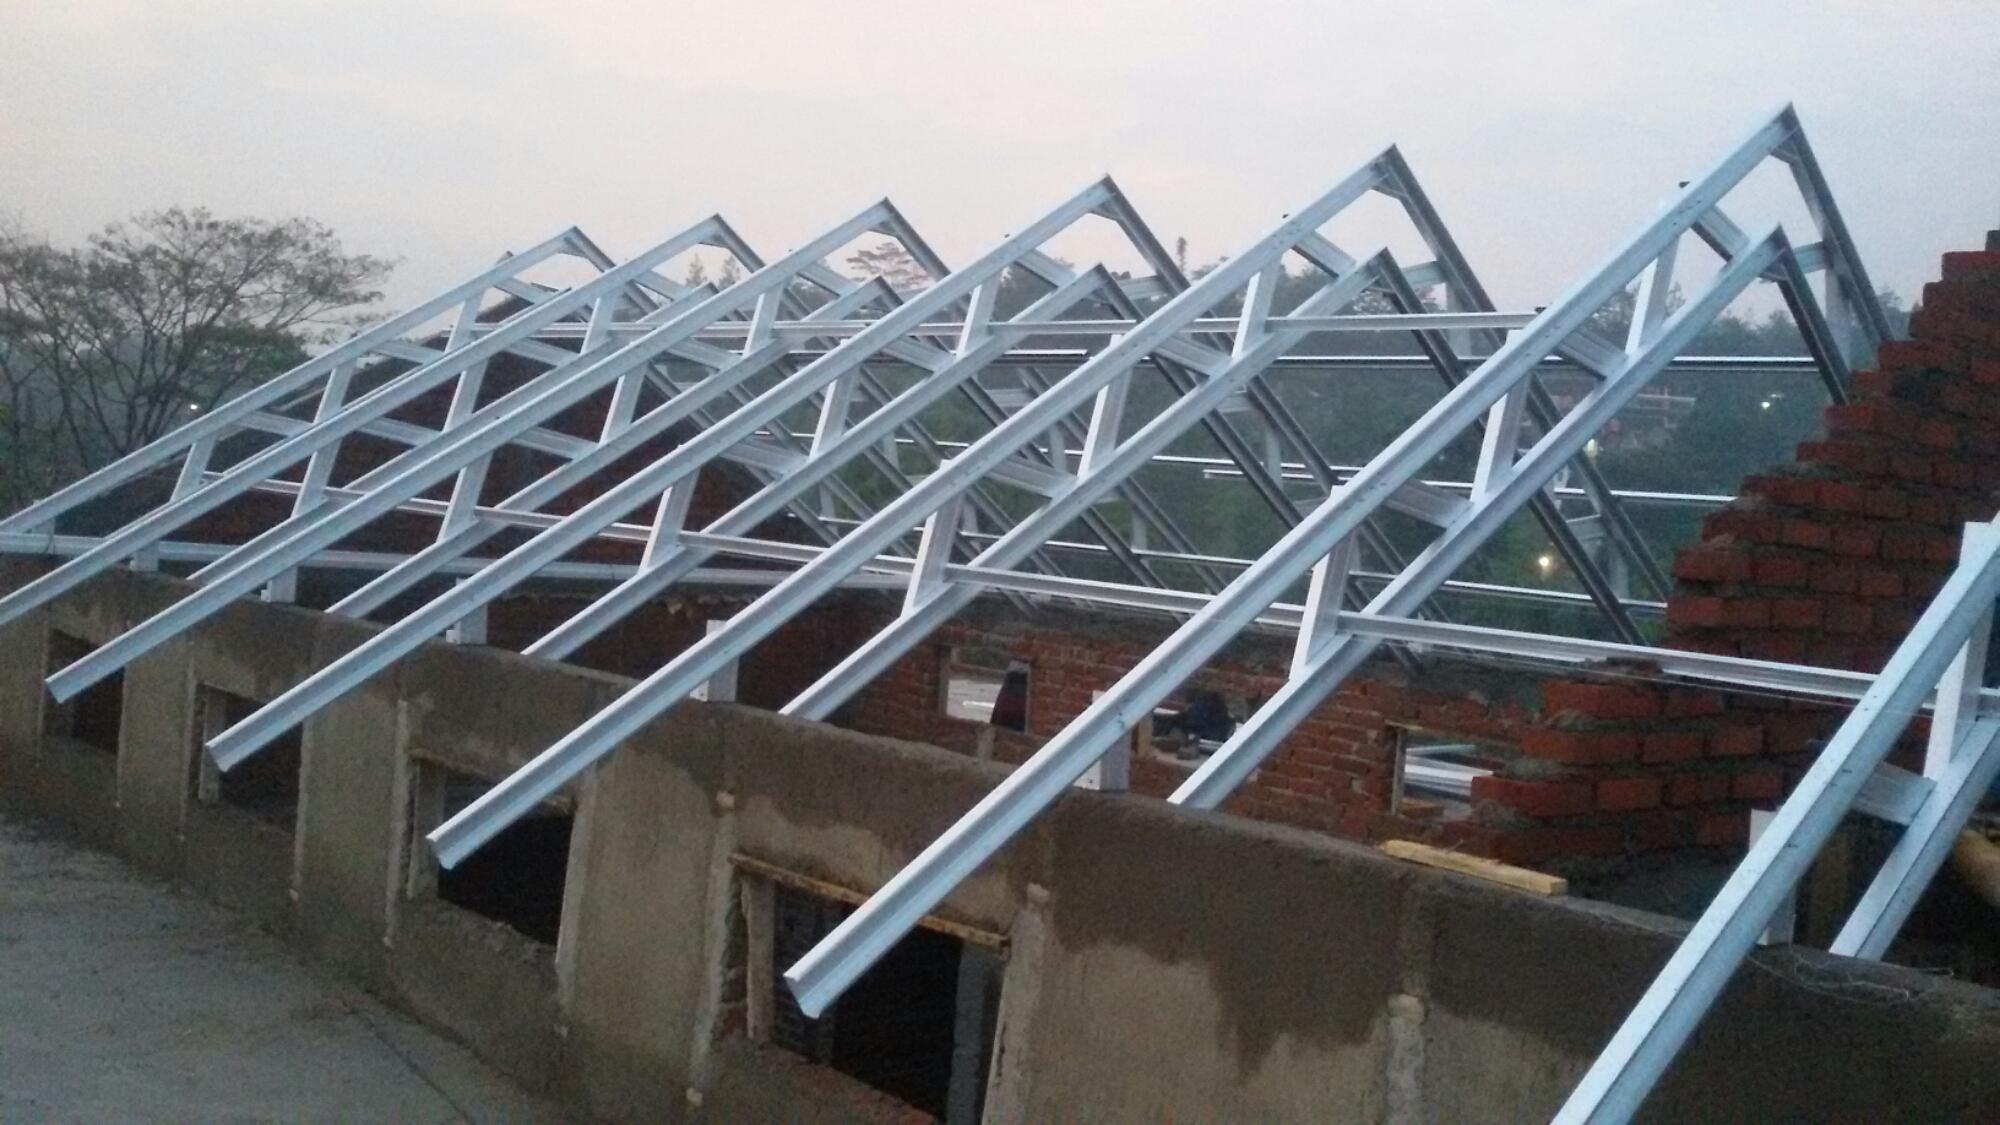 jasa pemasangan baja ringan di depok pasang atap rangka kanopi harga